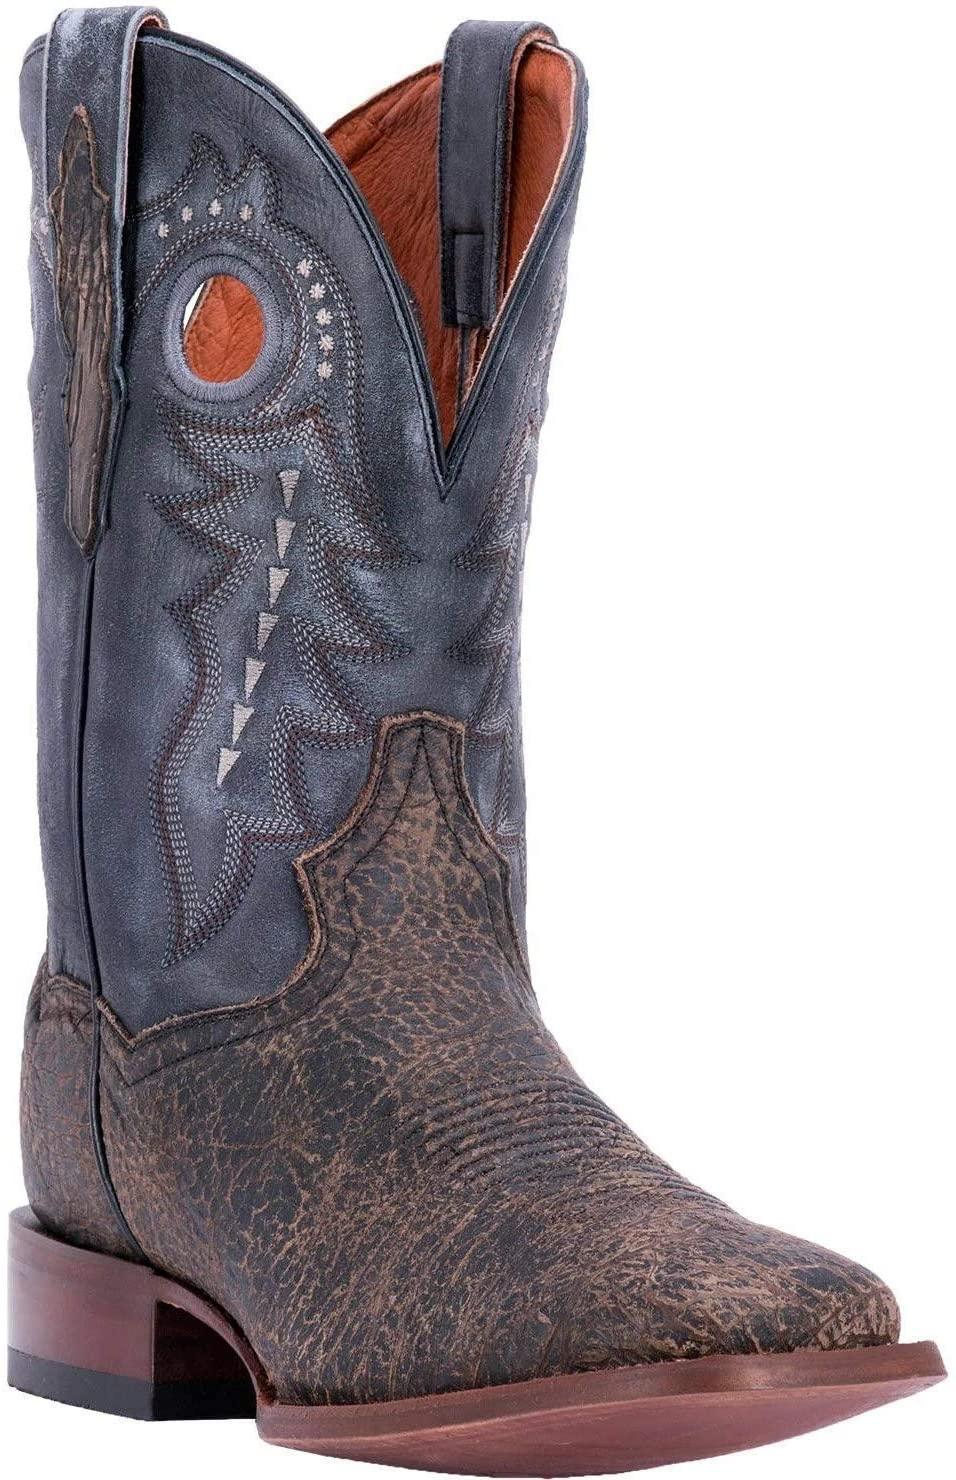 Dan Post Men's Badlands Cowboy Boot Square Toe - Dp3988